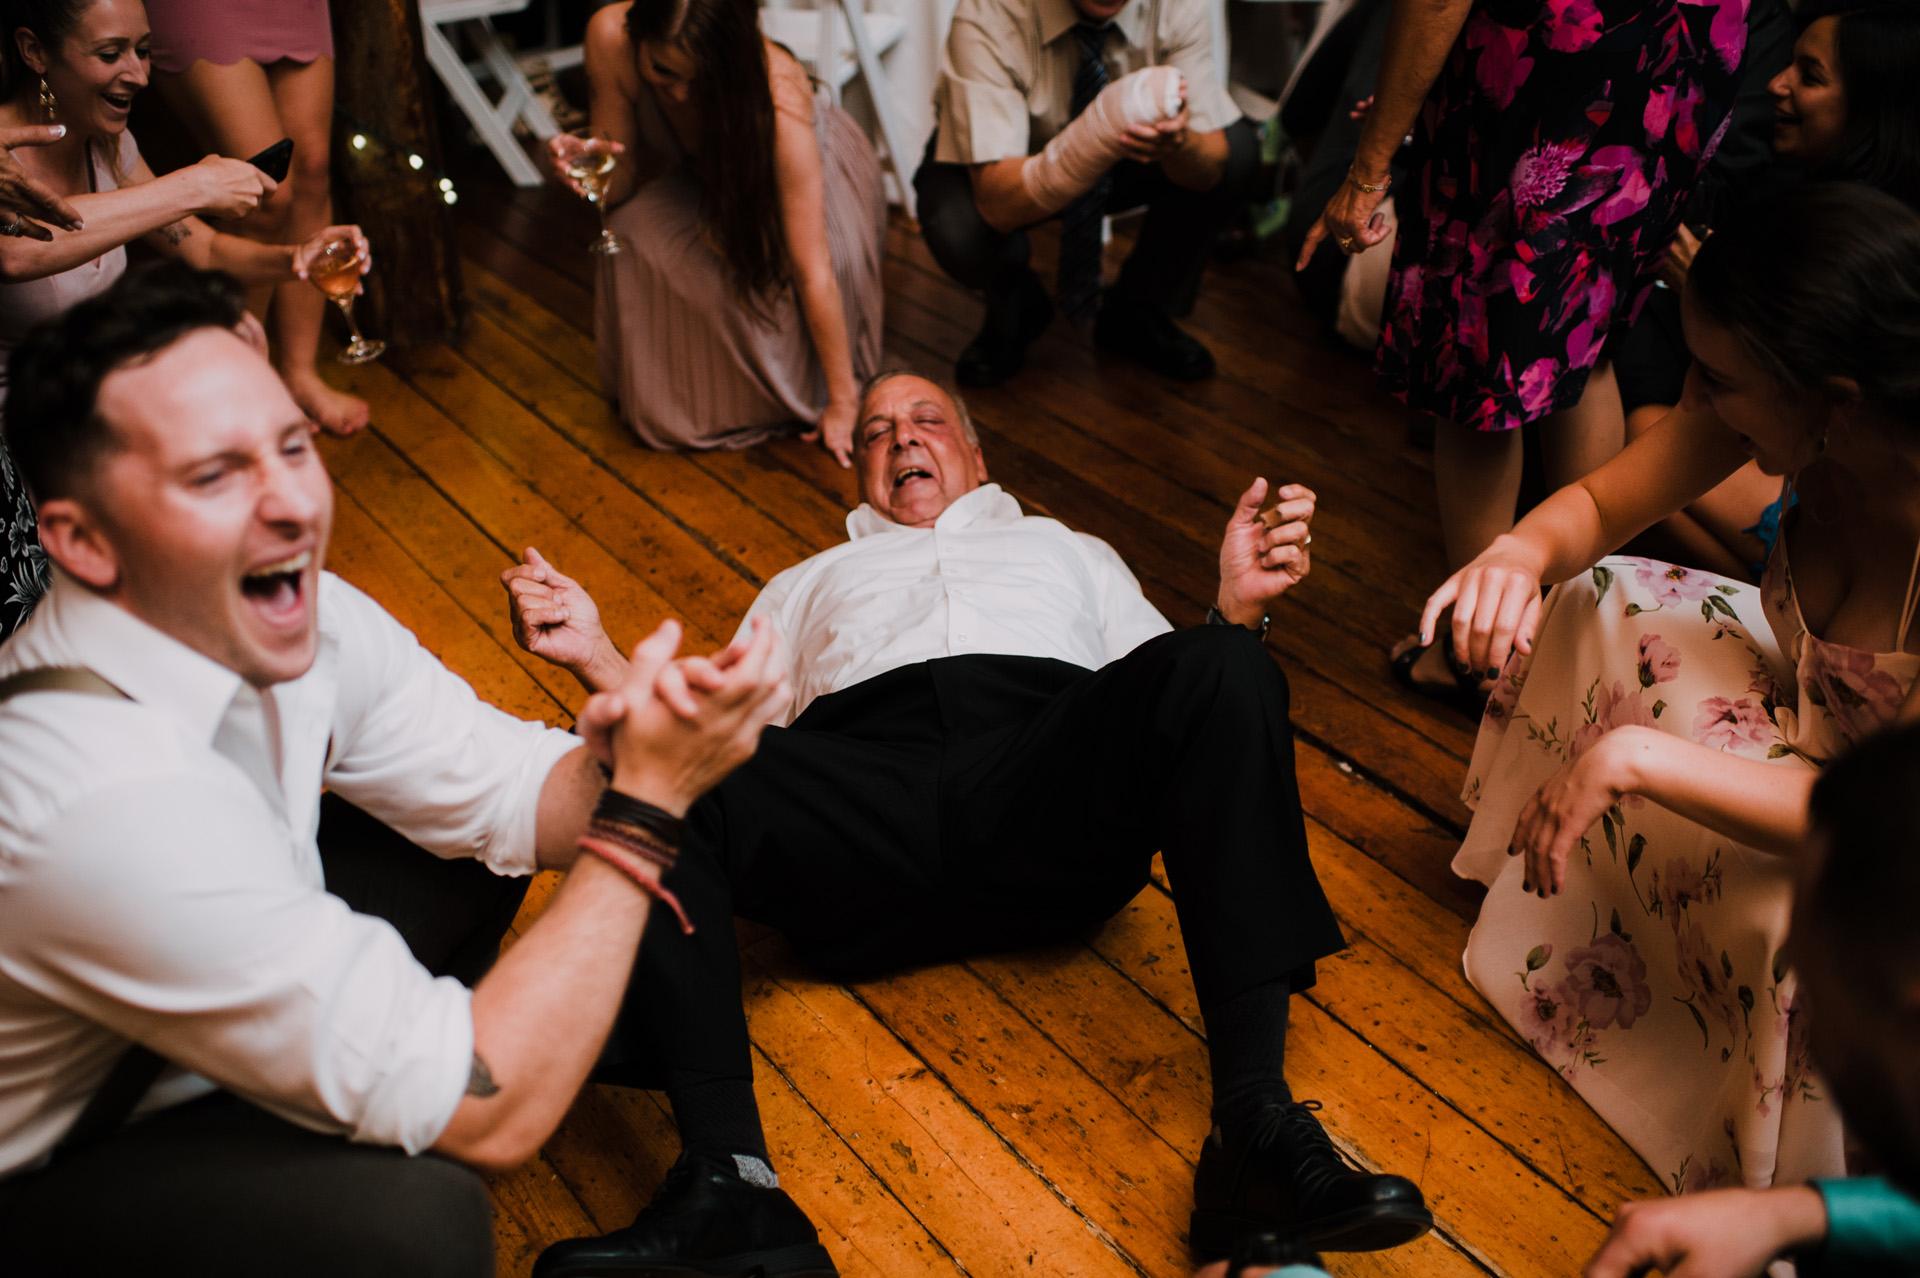 red-barn-hampshire-wedding-89